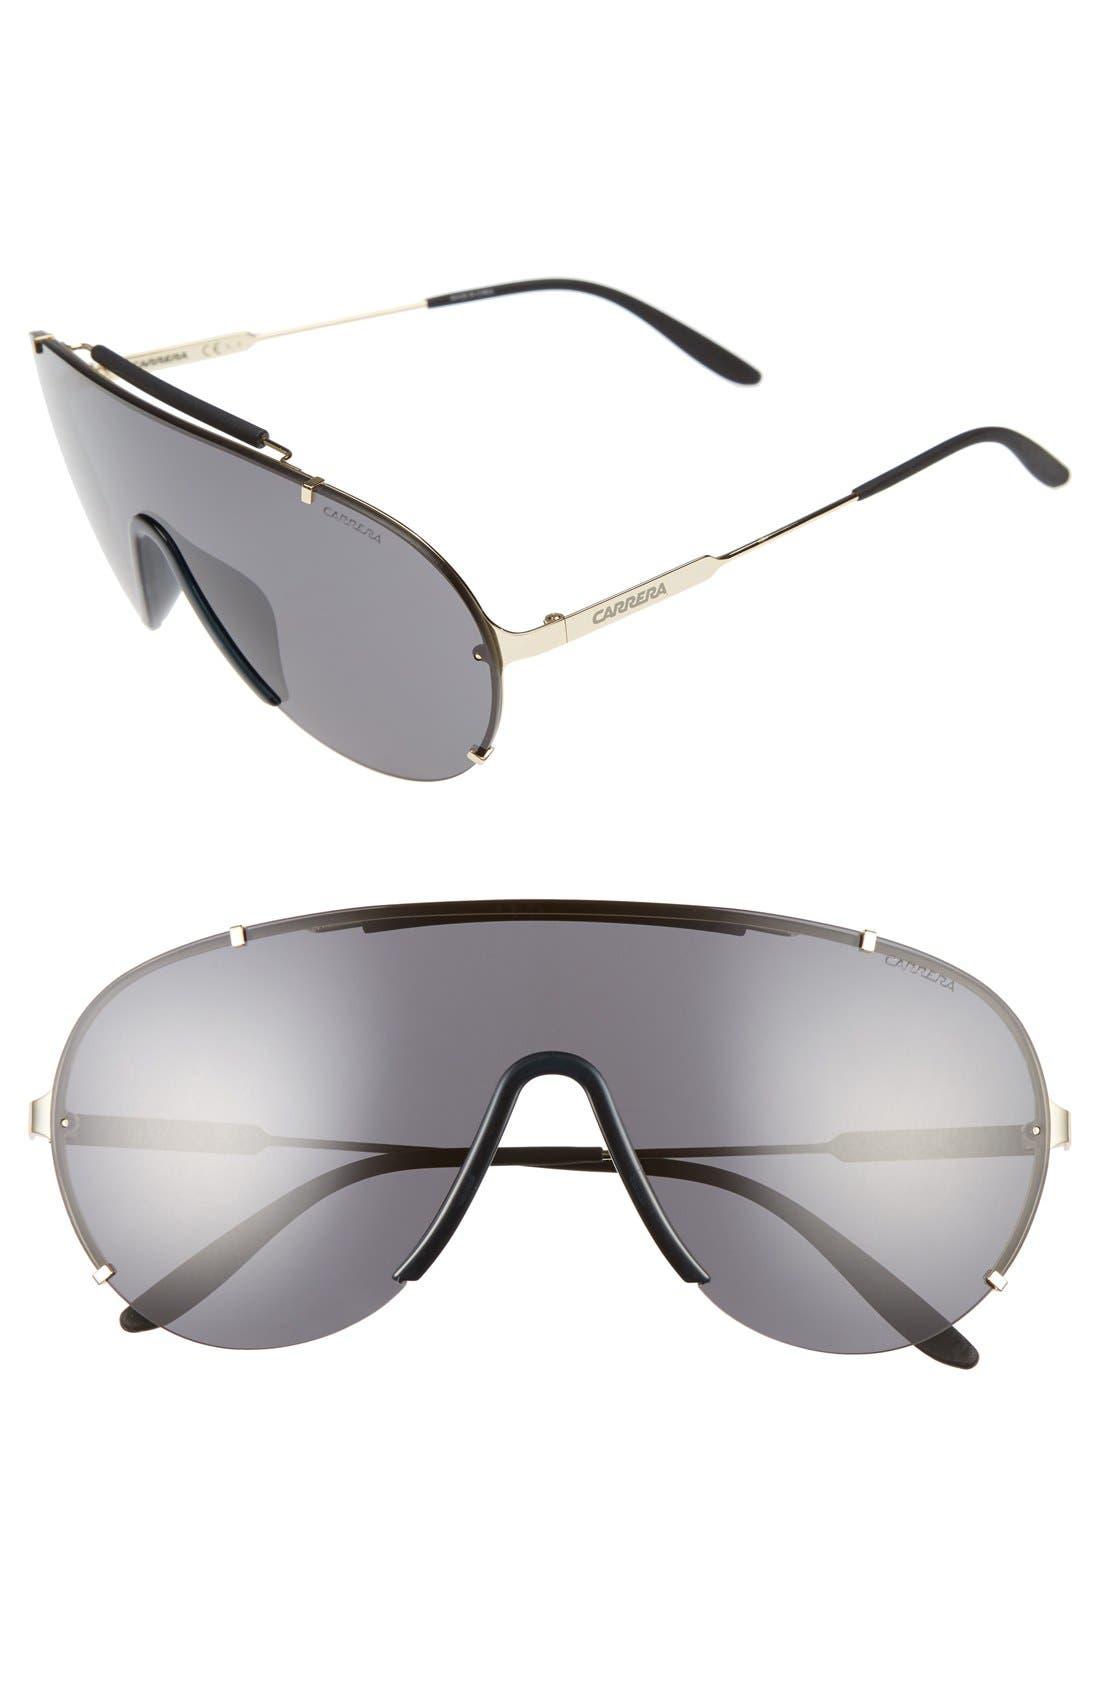 99mm Sunglasses,                         Main,                         color,